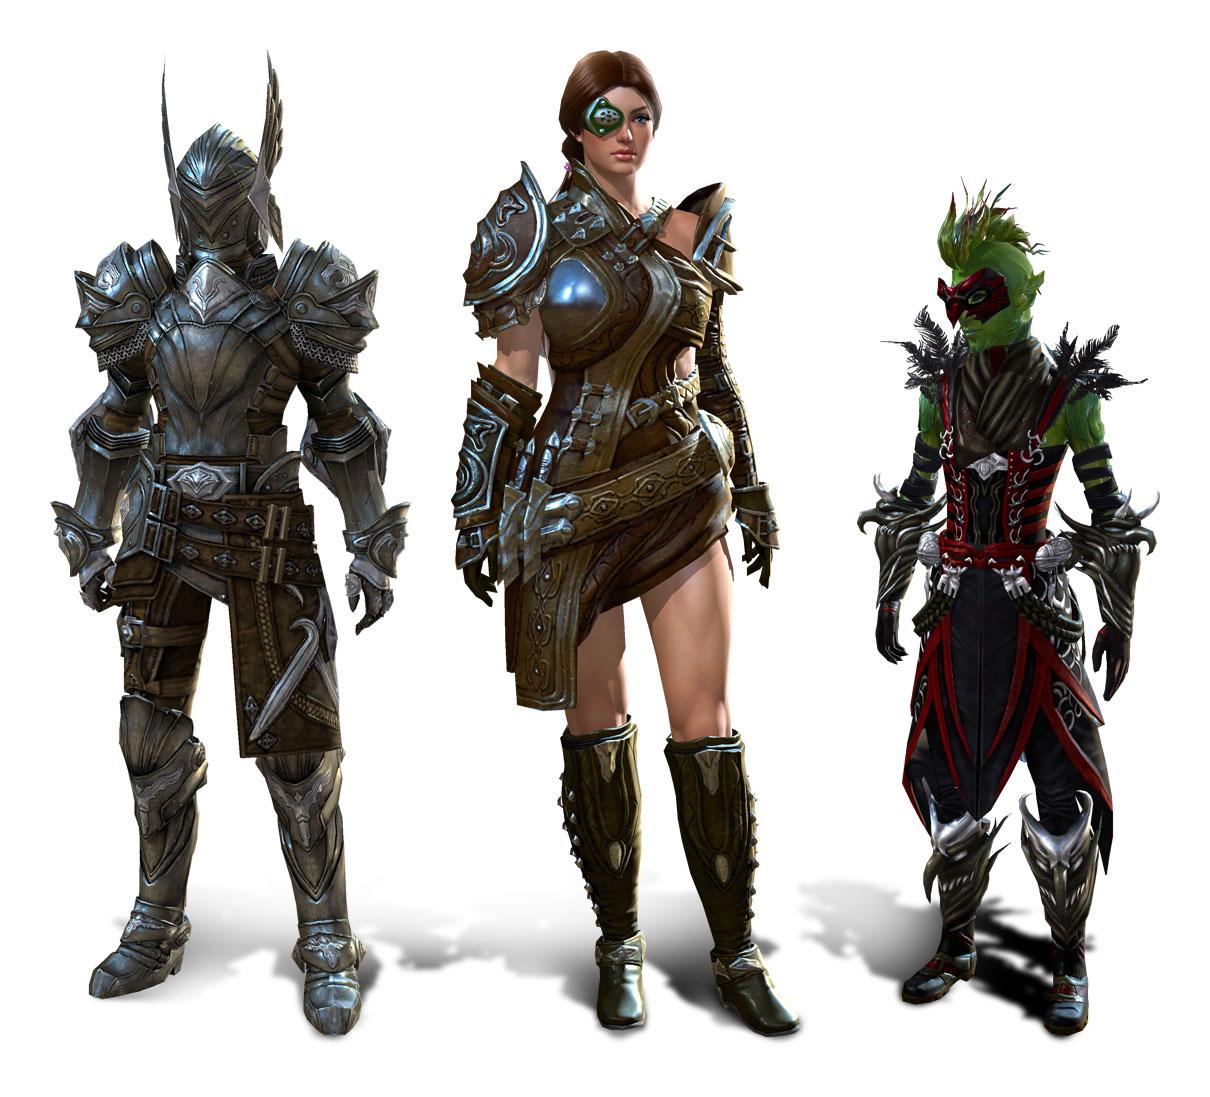 guild wars 2 armor - photo #15